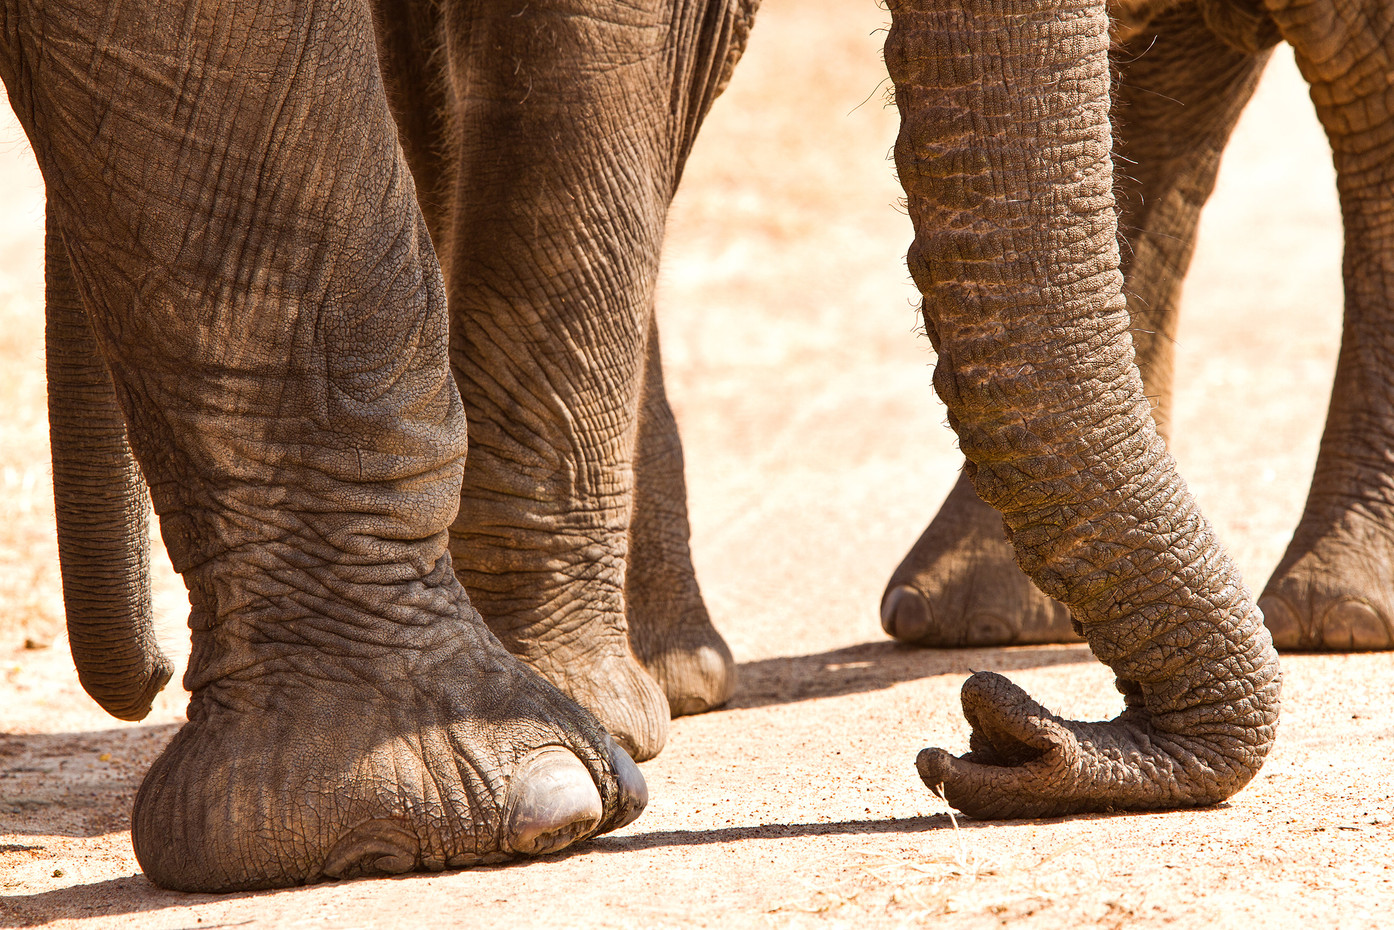 Elephants in Manyara NP, Tanzania